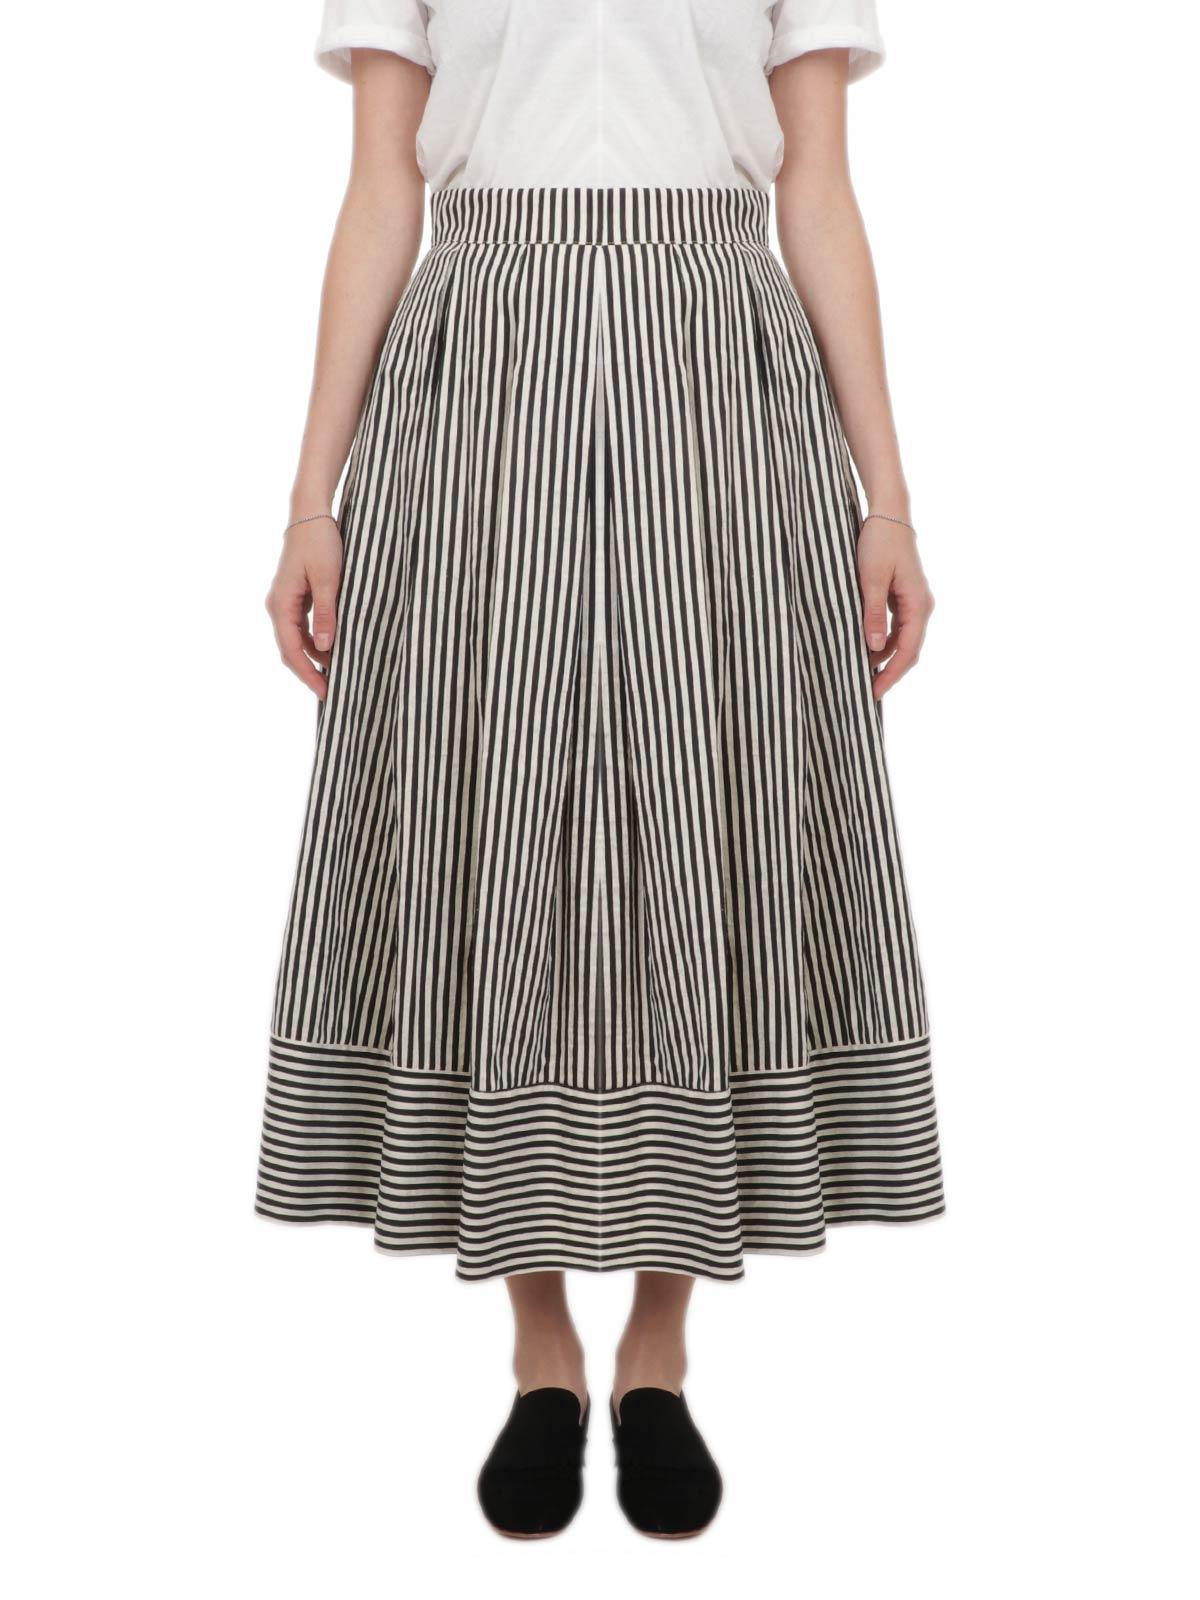 Picture of 19.61 | Women's Striped Miranda Skirt